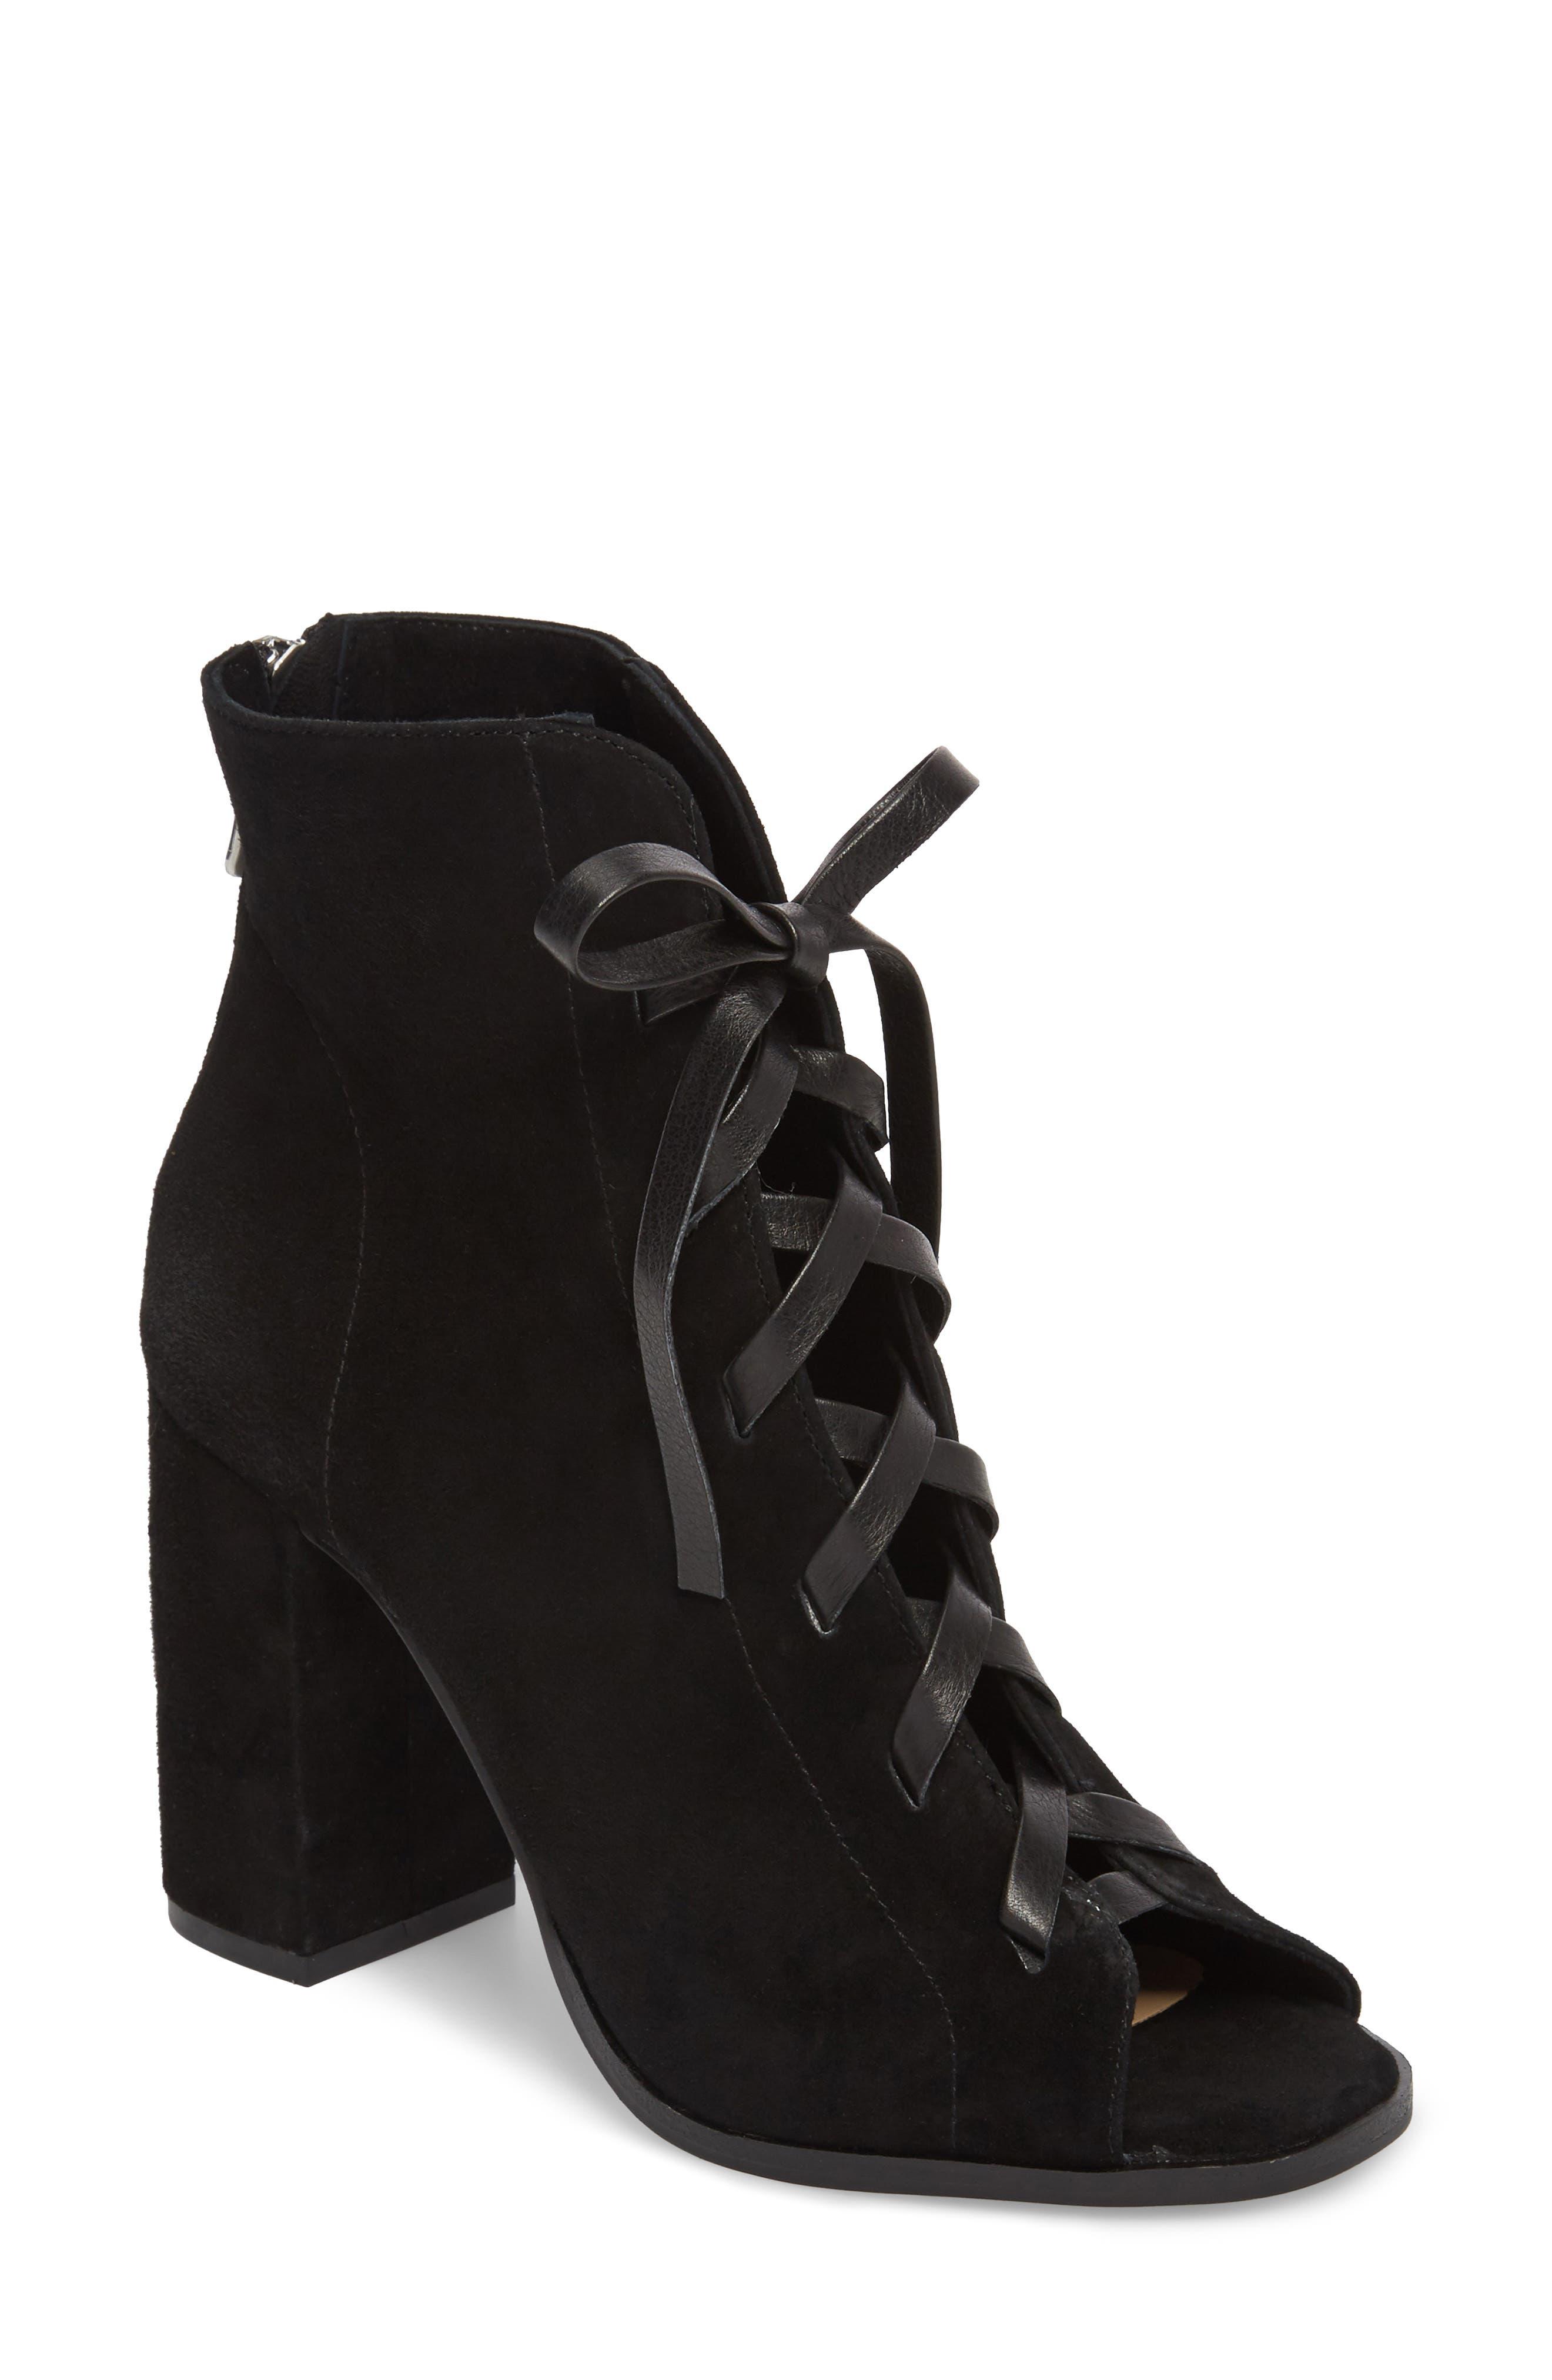 Main Image - Kristin Cavallari Layton Lace-Up Boot (Women)